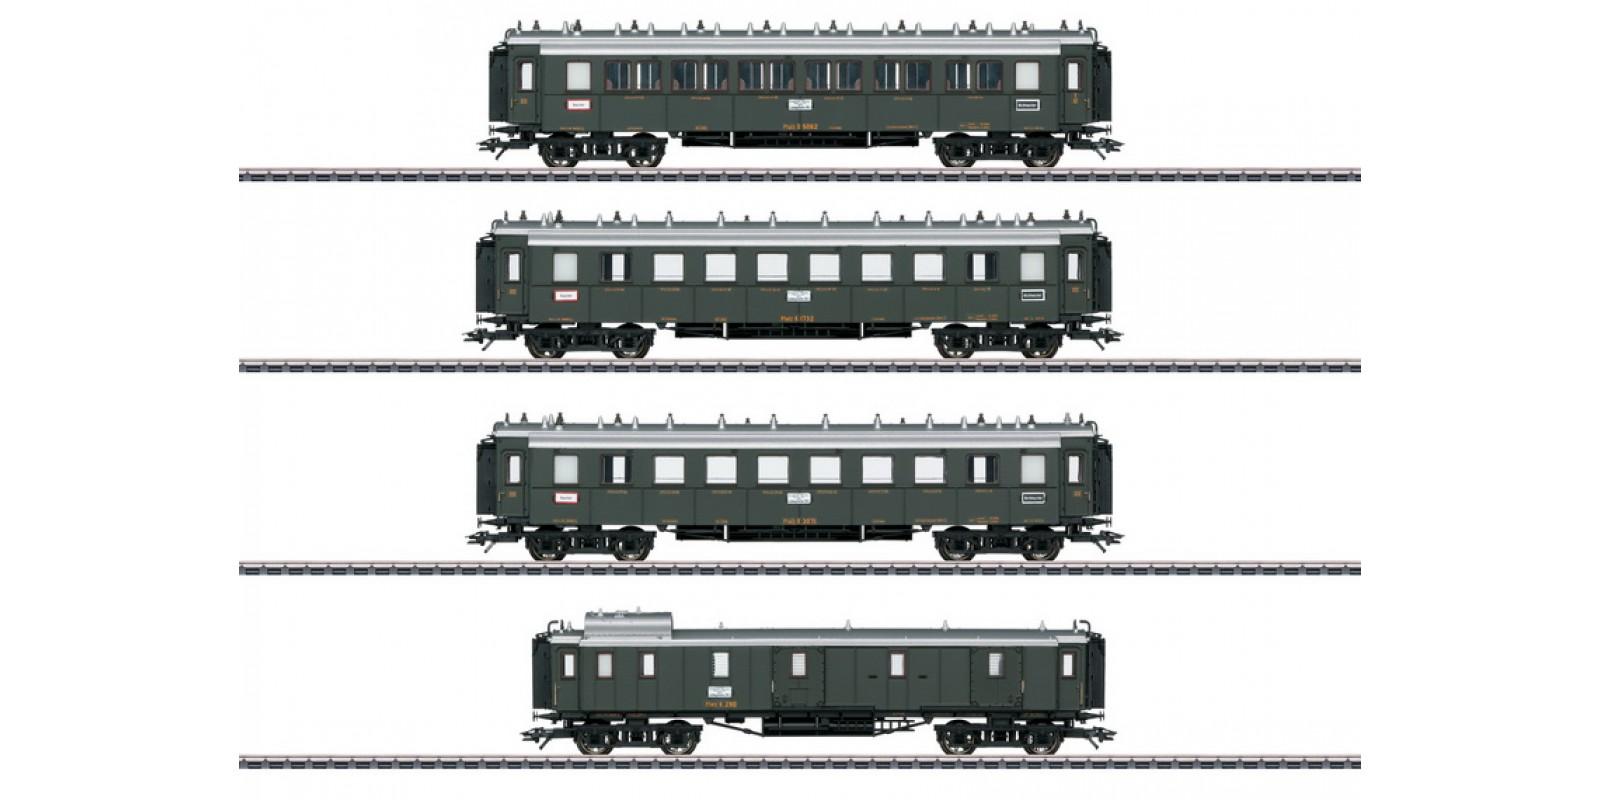 "41354 ""Palatine Railroad"" Express Train Passenger Car Set"